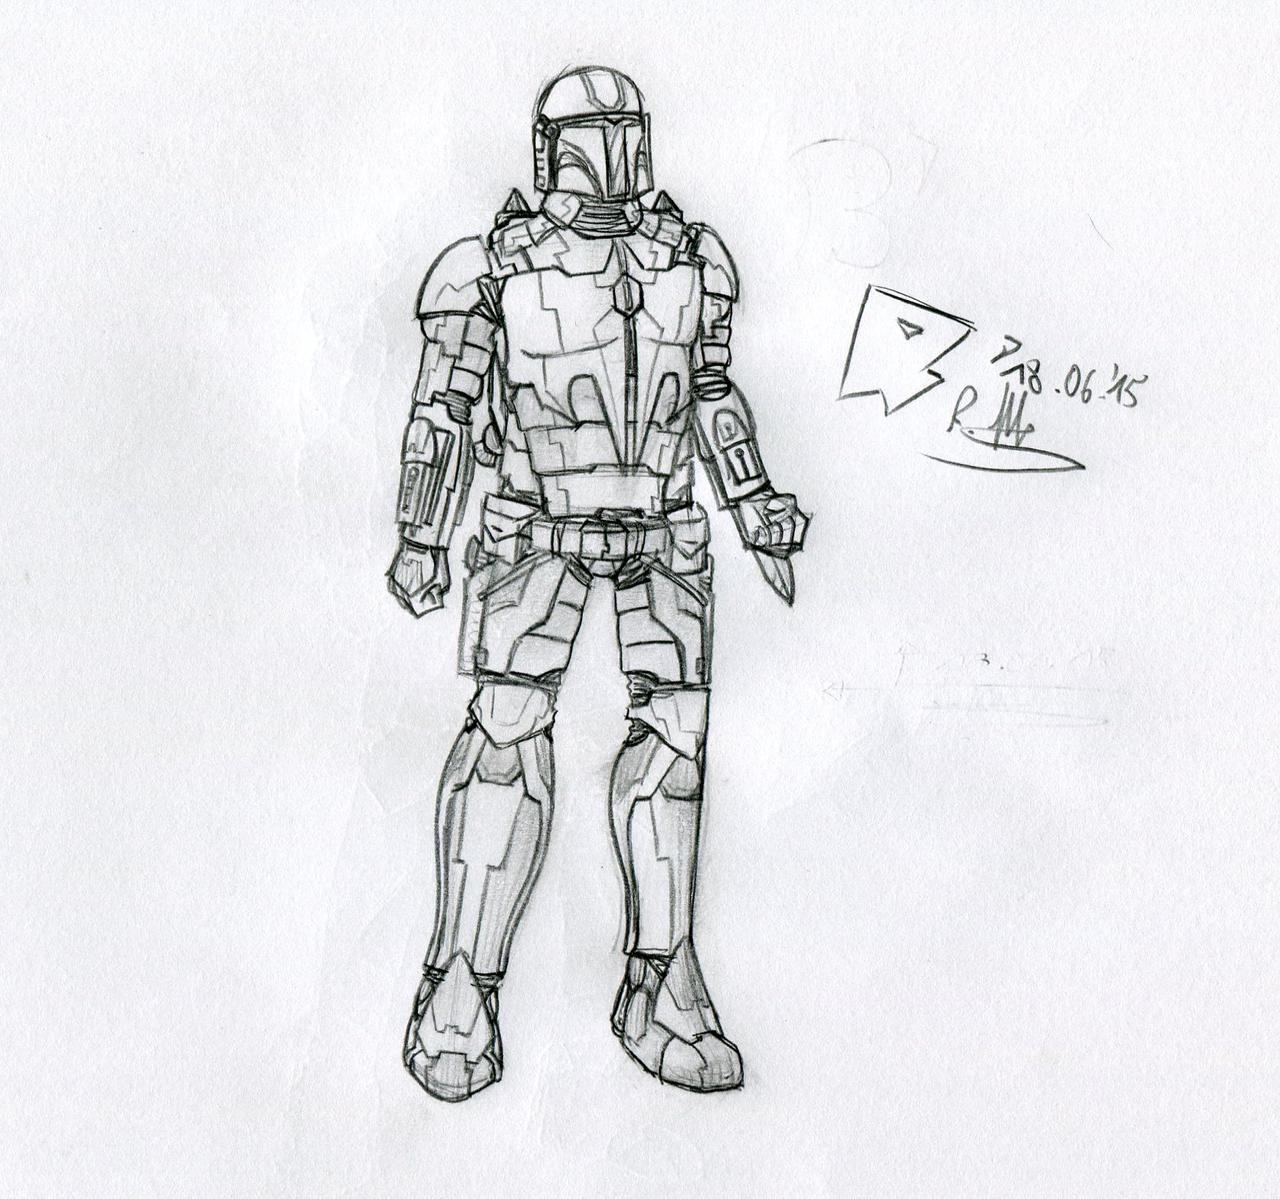 clipart free download Mandalorian Battle Armor